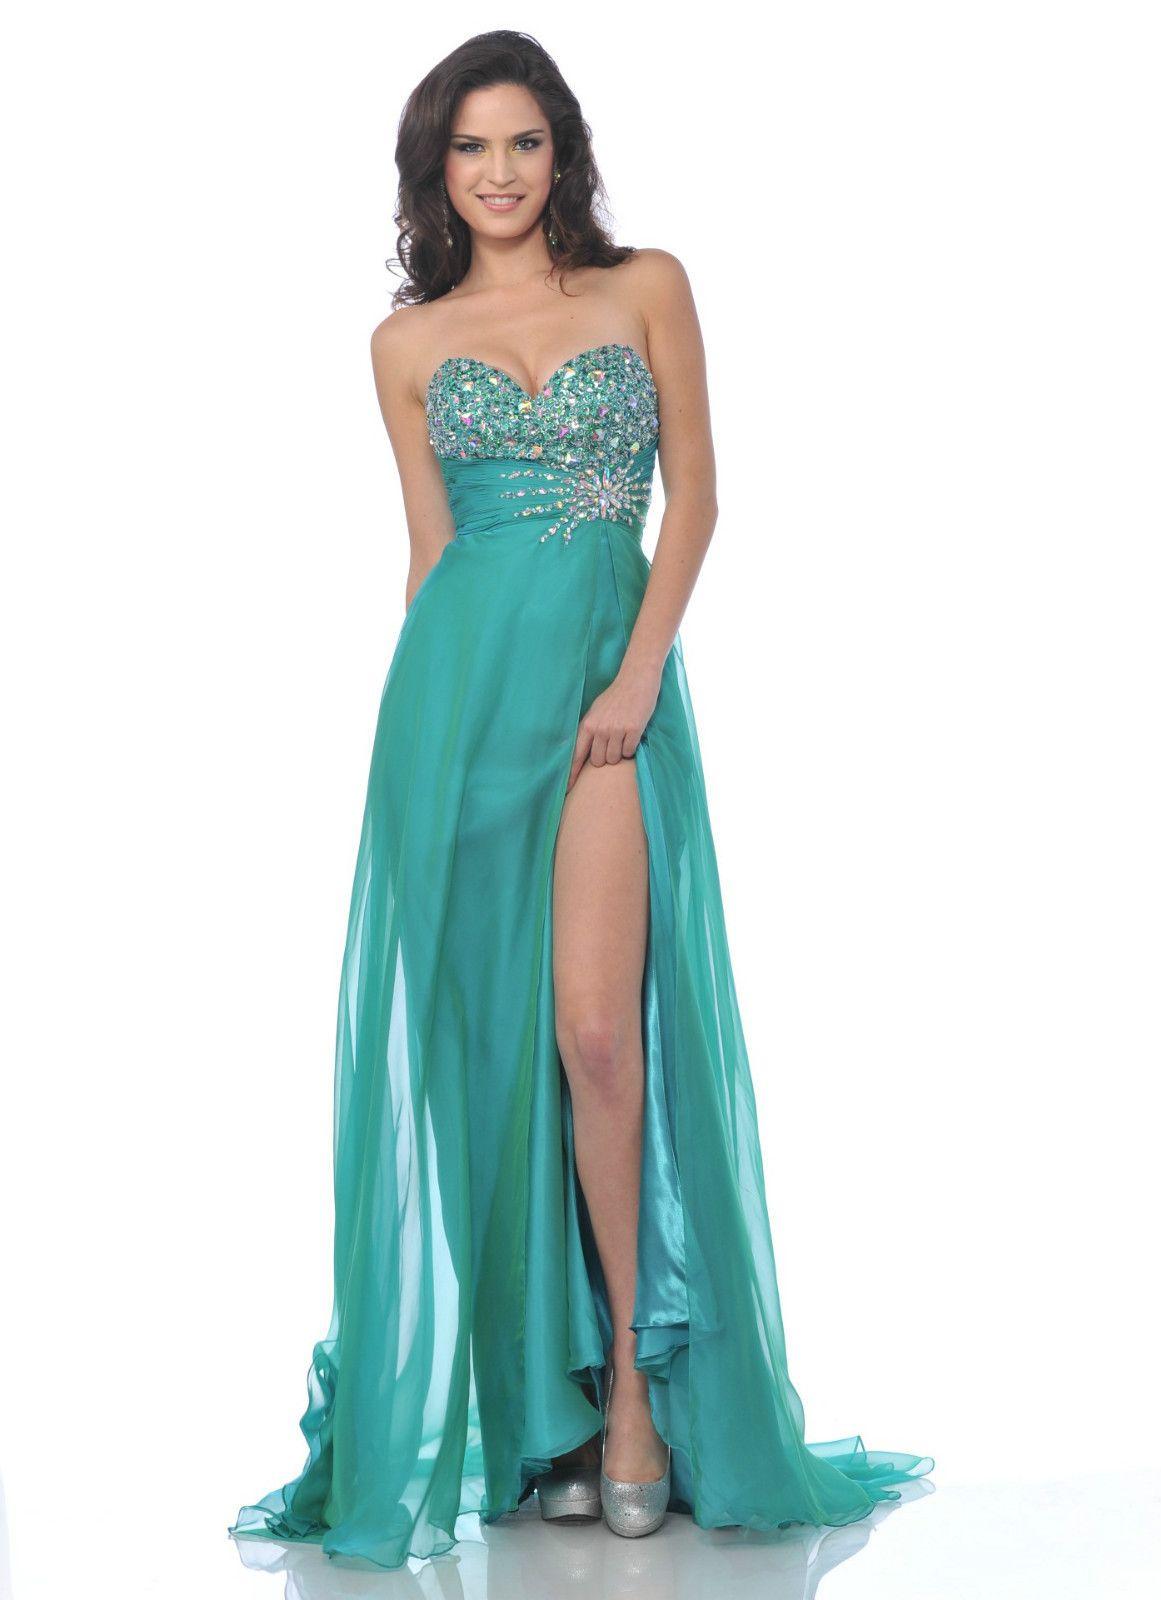 Beautiful Elegant Long Formal Gown Prom Fashionable Bridesmaid ...